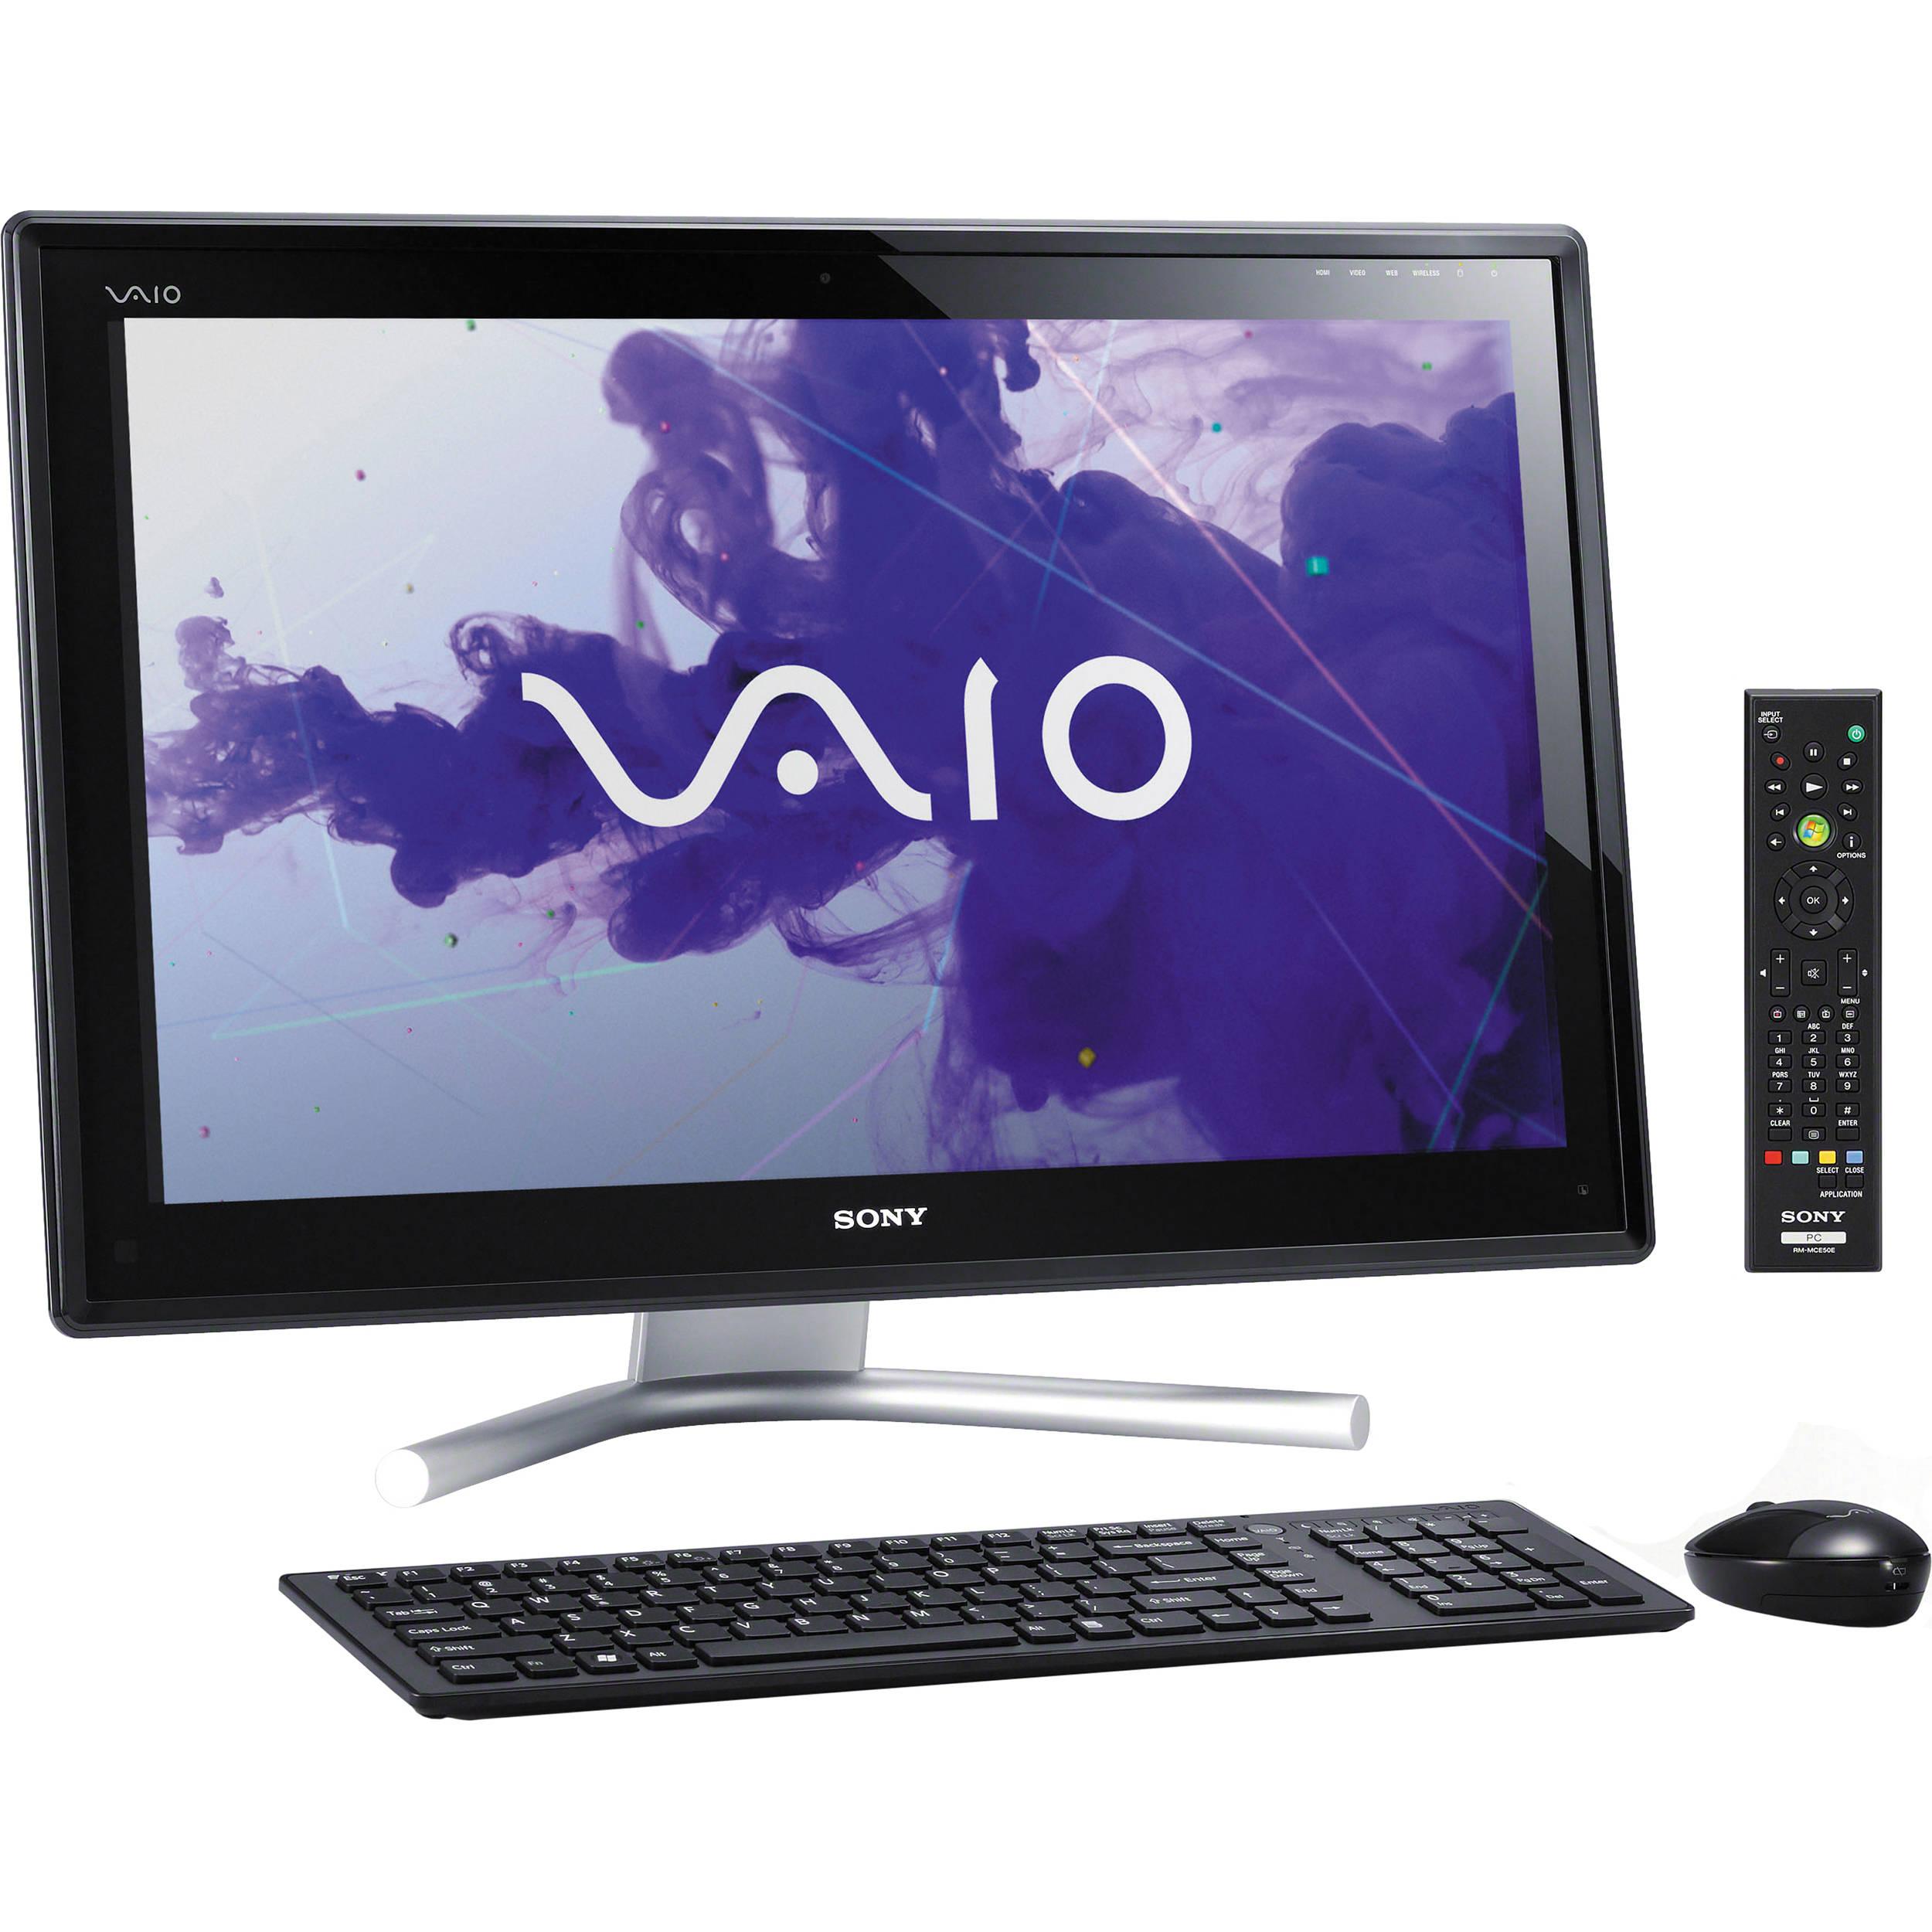 Sony VAIO L23 VPCL236FX/B 24